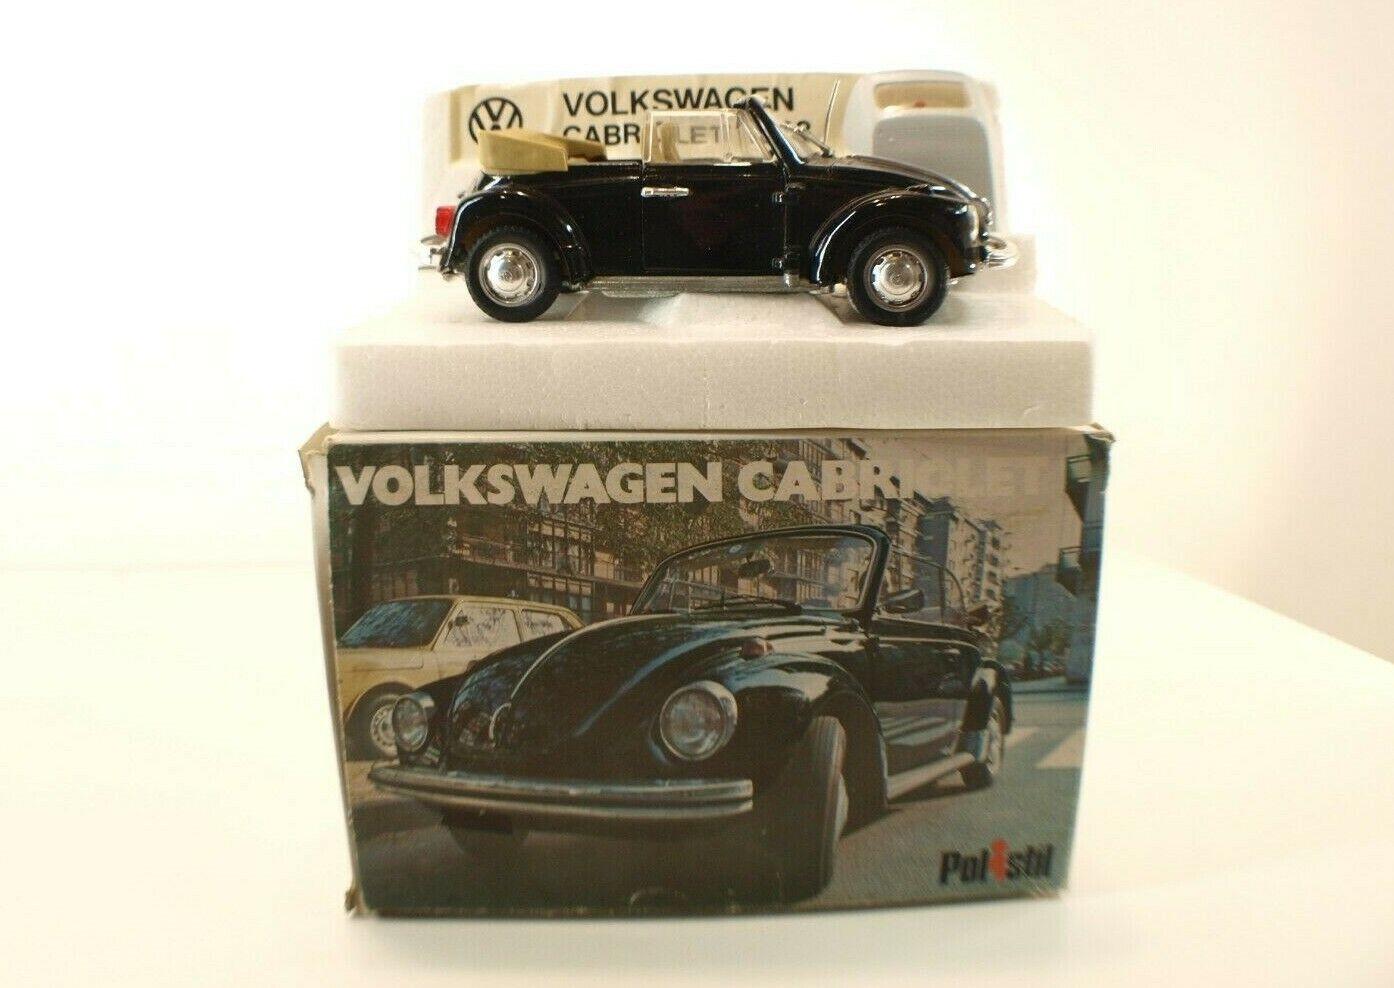 Polistil S15 Volkswagen cabriolet 1303 1/25 neuf en boite/boxed Mint in box